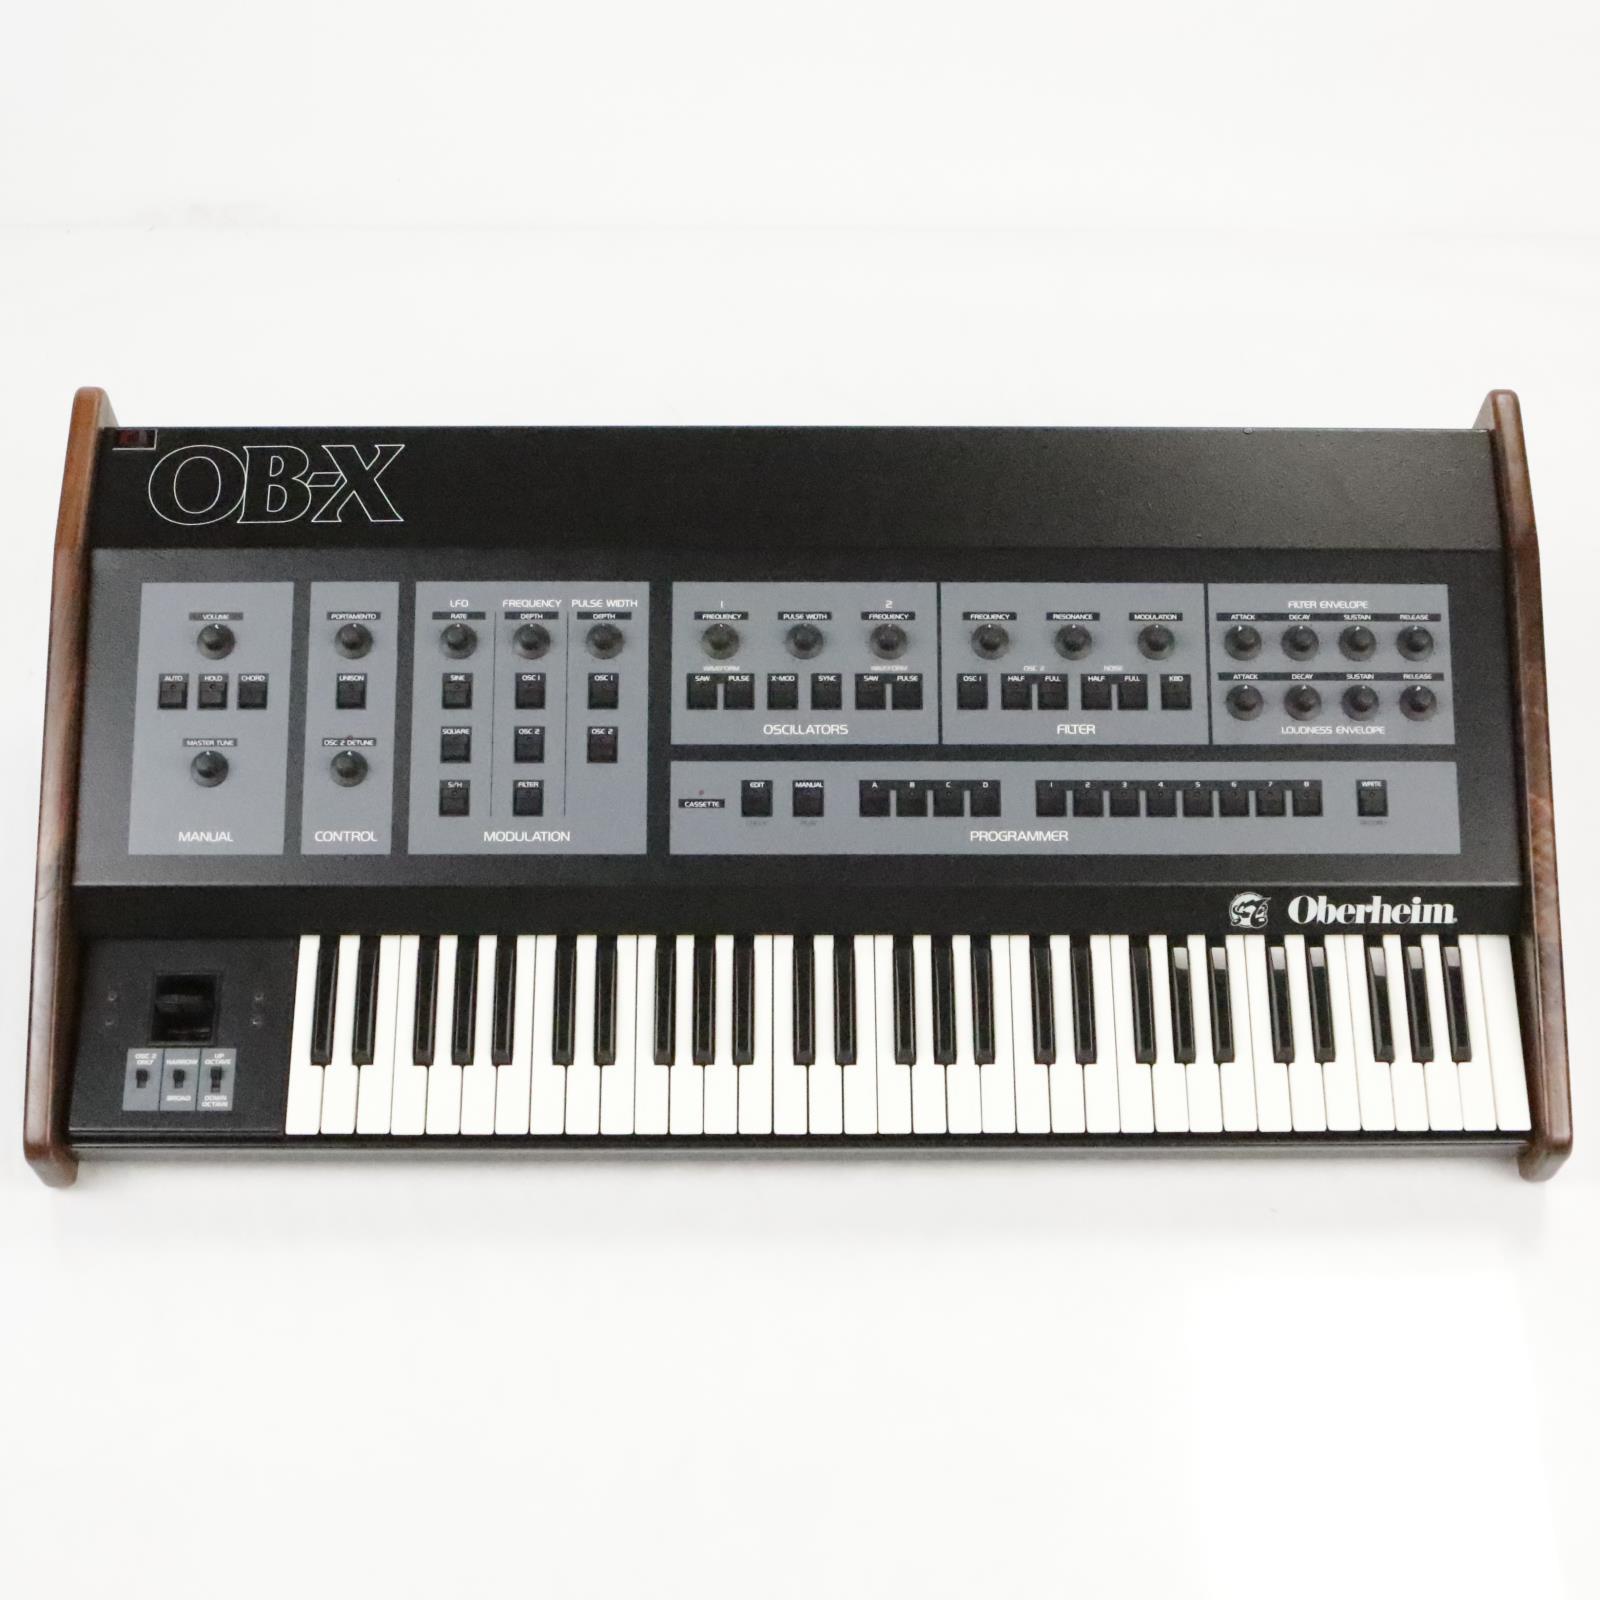 Oberheim OB-X Analog 8 Voice Synthesizer w/ Encore MIDI & 24db filter Mod #35984